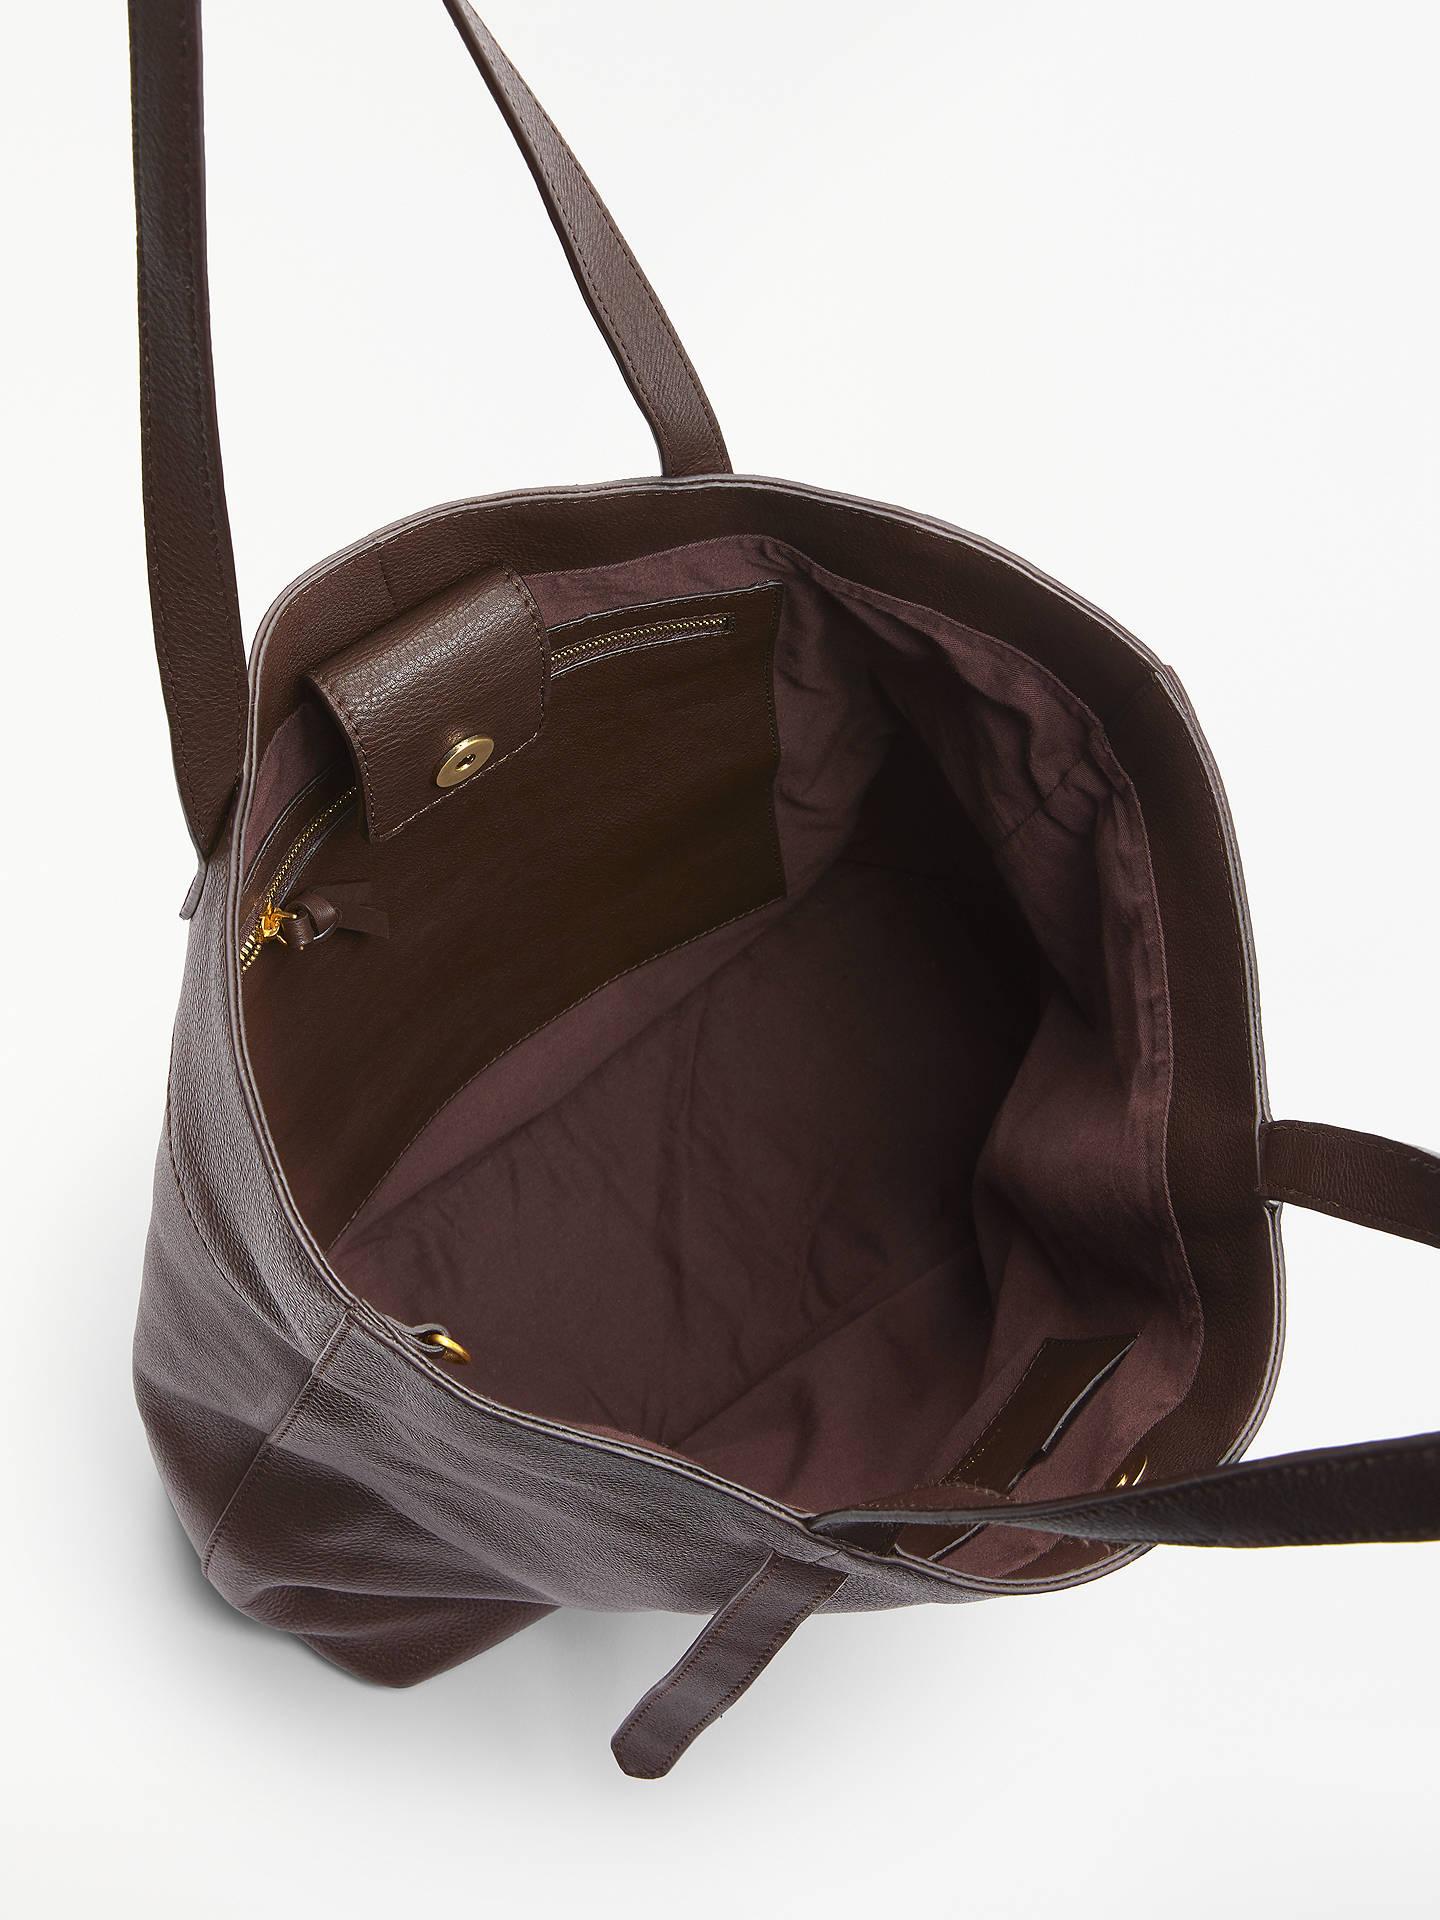 305cbf1c22c8 John Lewis   Partners Cecilia Leather North South Tote Bag at John ...